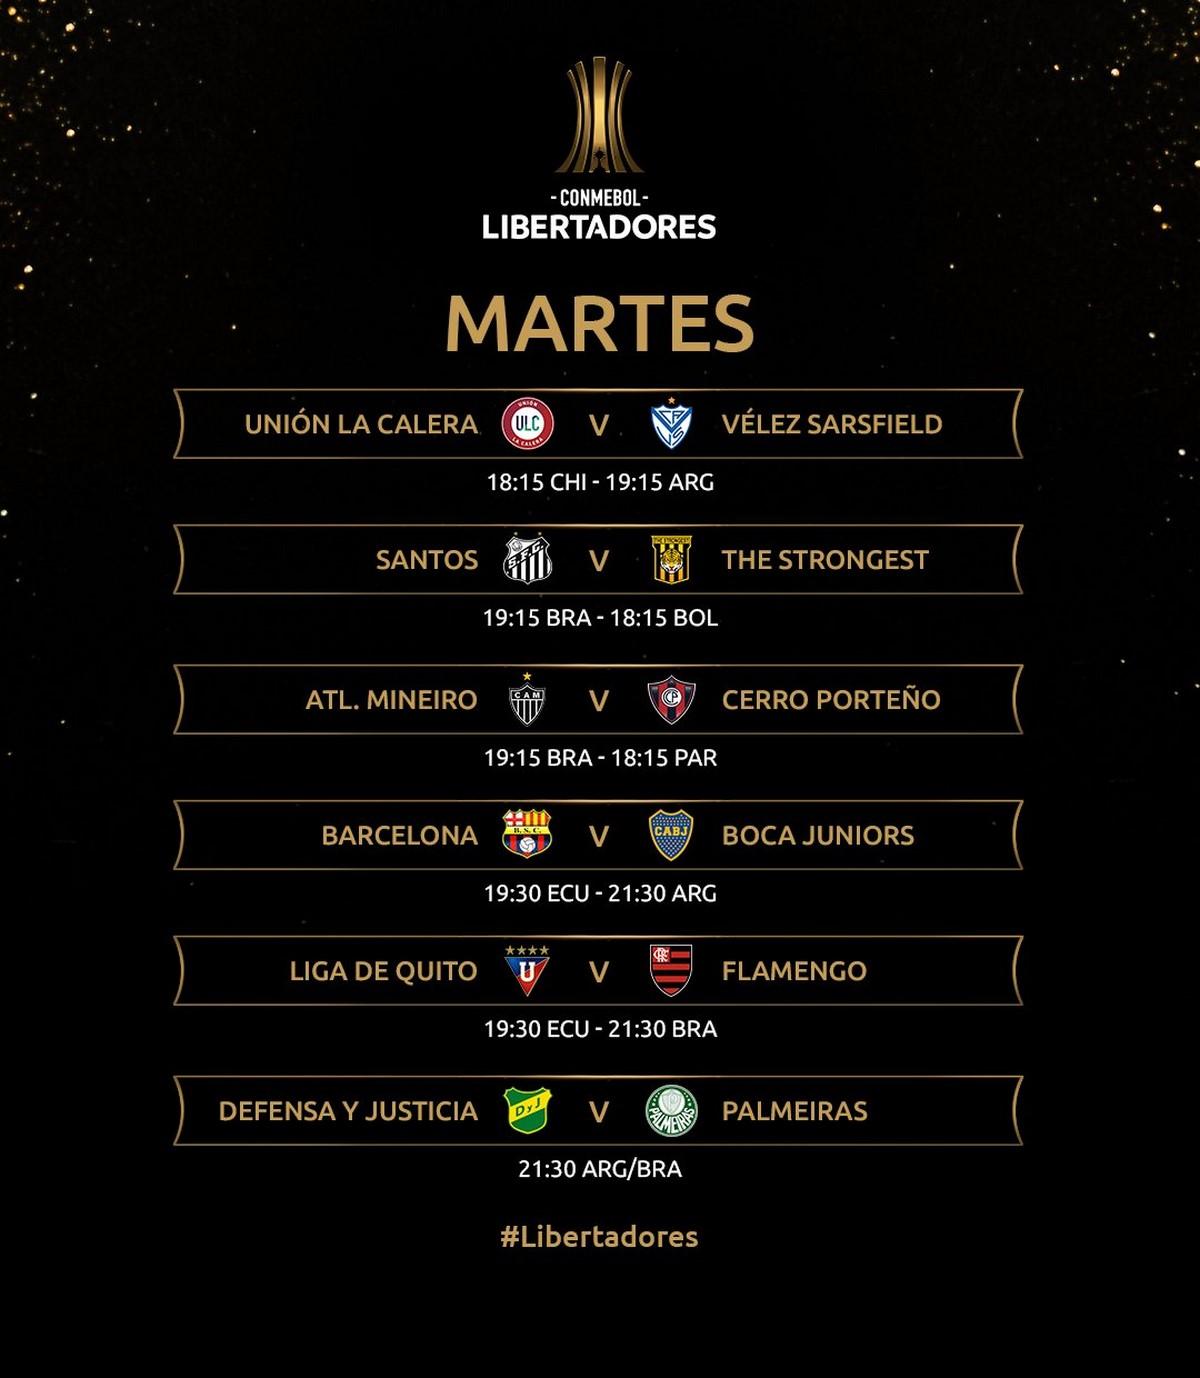 Programacion Copa Libertadores mayo 4 2